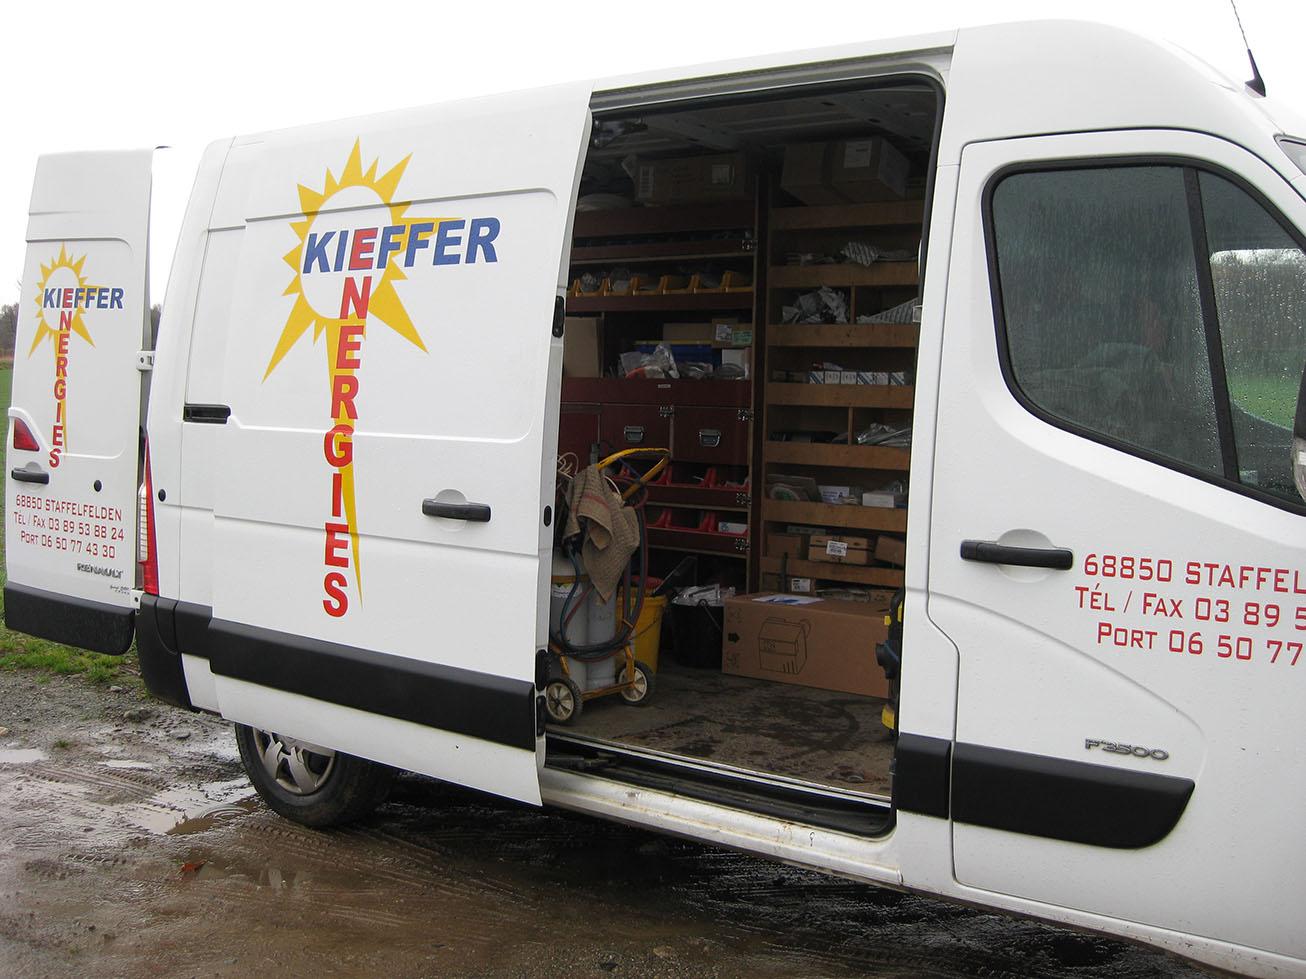 camionnette kieffer energie-min